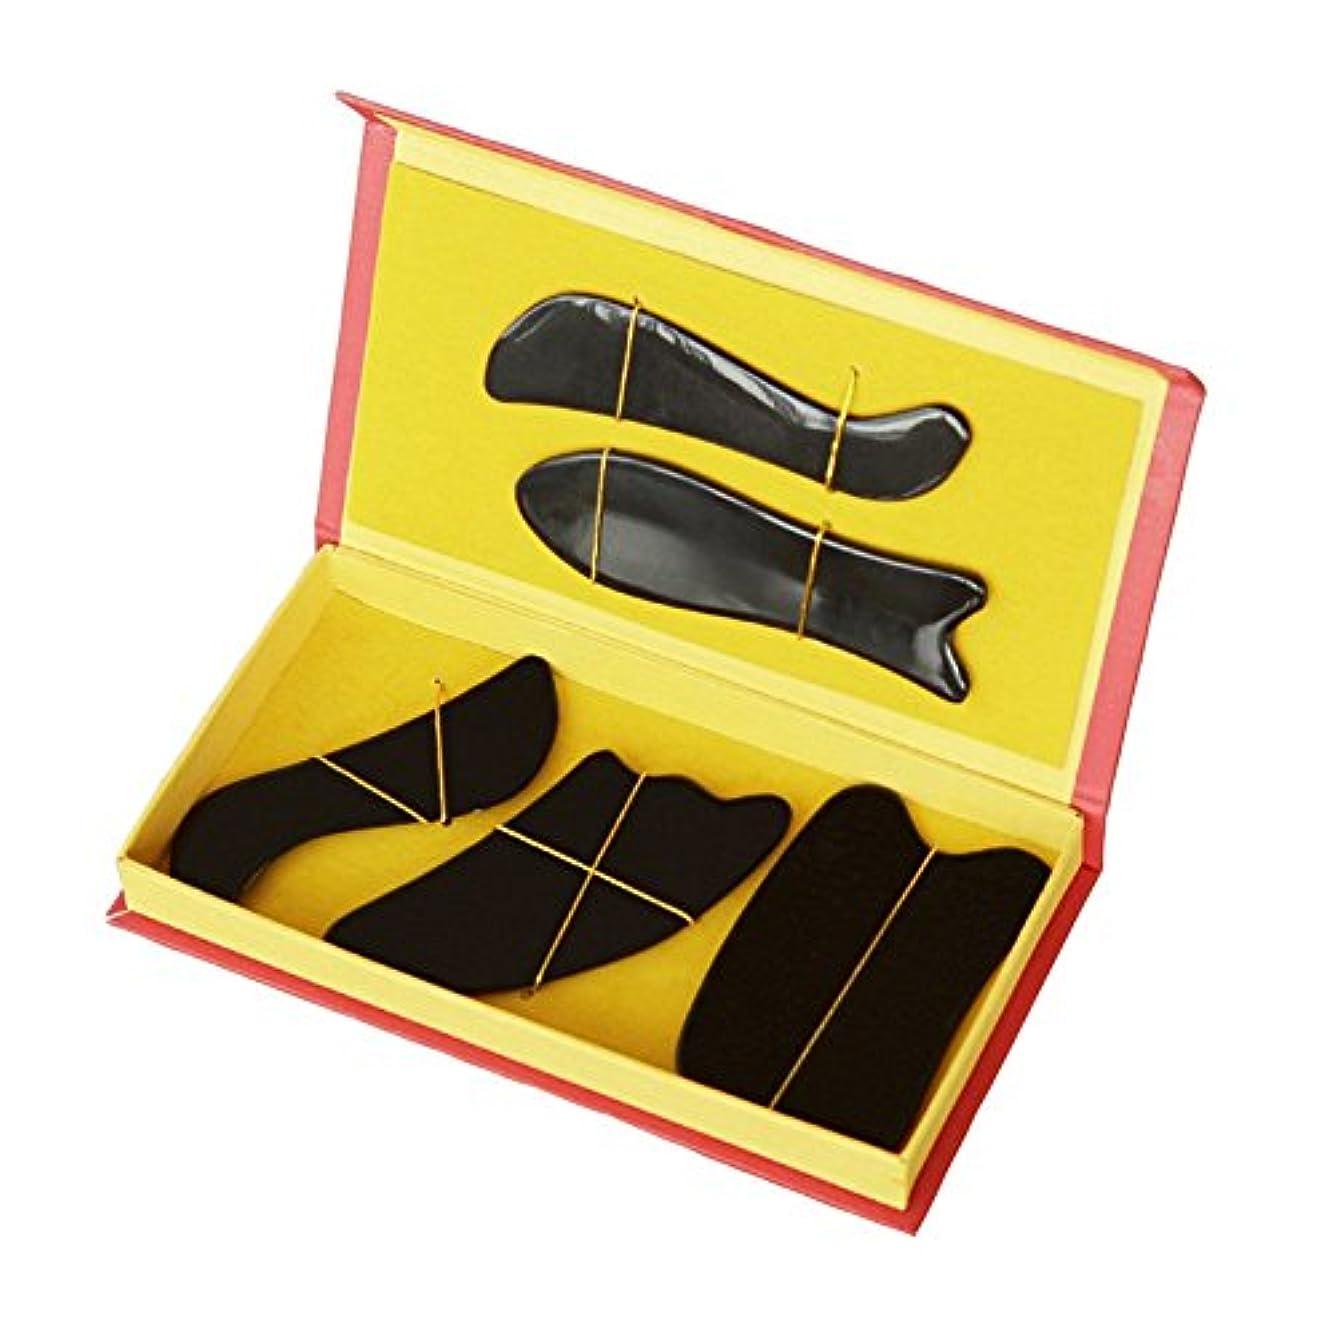 EQLEF 牛角カッサ·セット、カッサボード、カッサマッサージ道具  滑らかな牛角かっさプレート